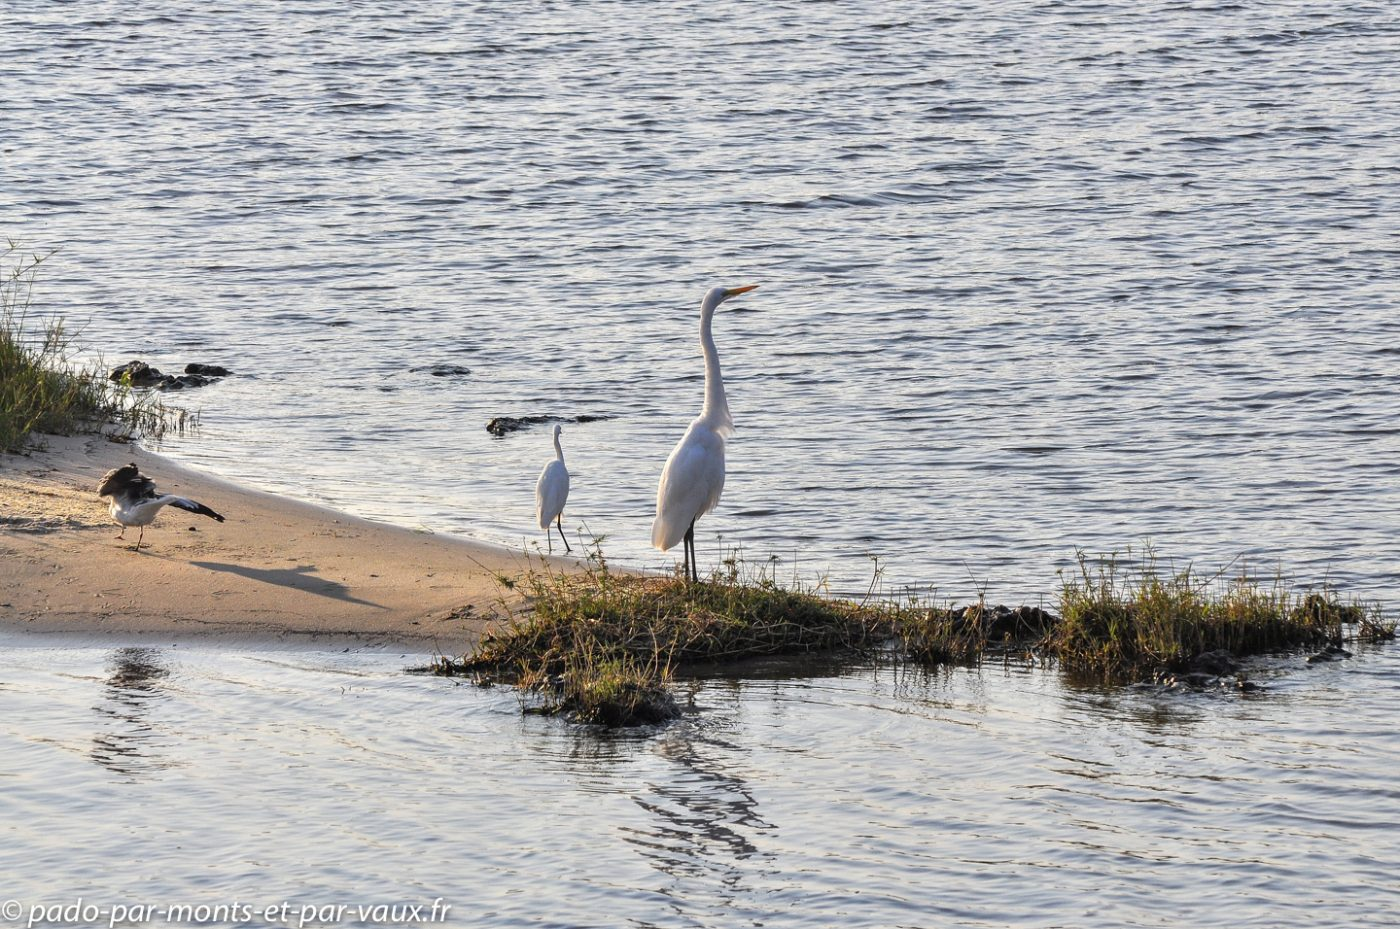 Rivière Chobe - Grande Aigrette